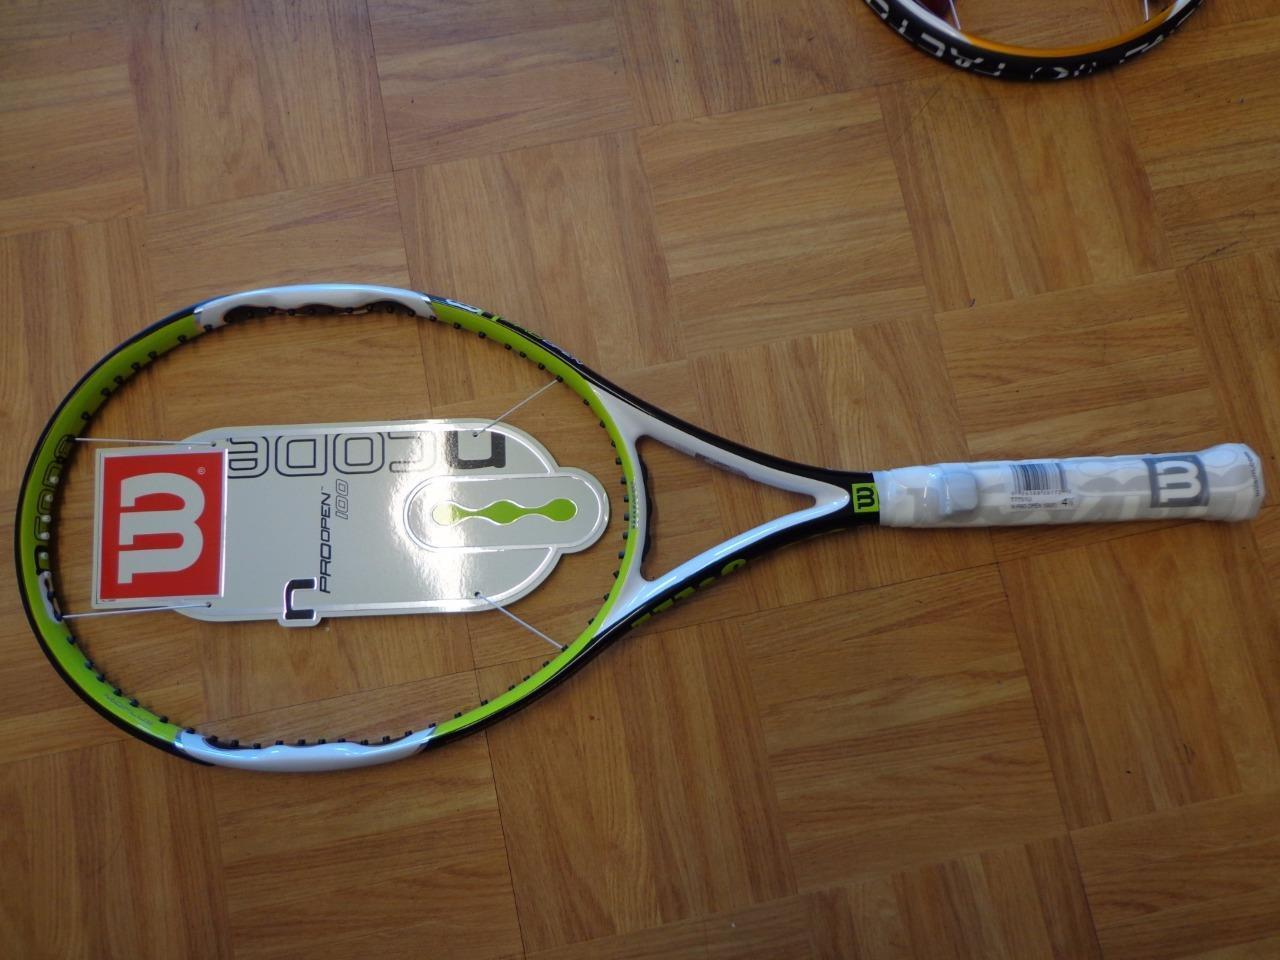 NEUF RARE Wilson NCode N Pro Open 100 Head 4 1 2 grip raquette de tennis